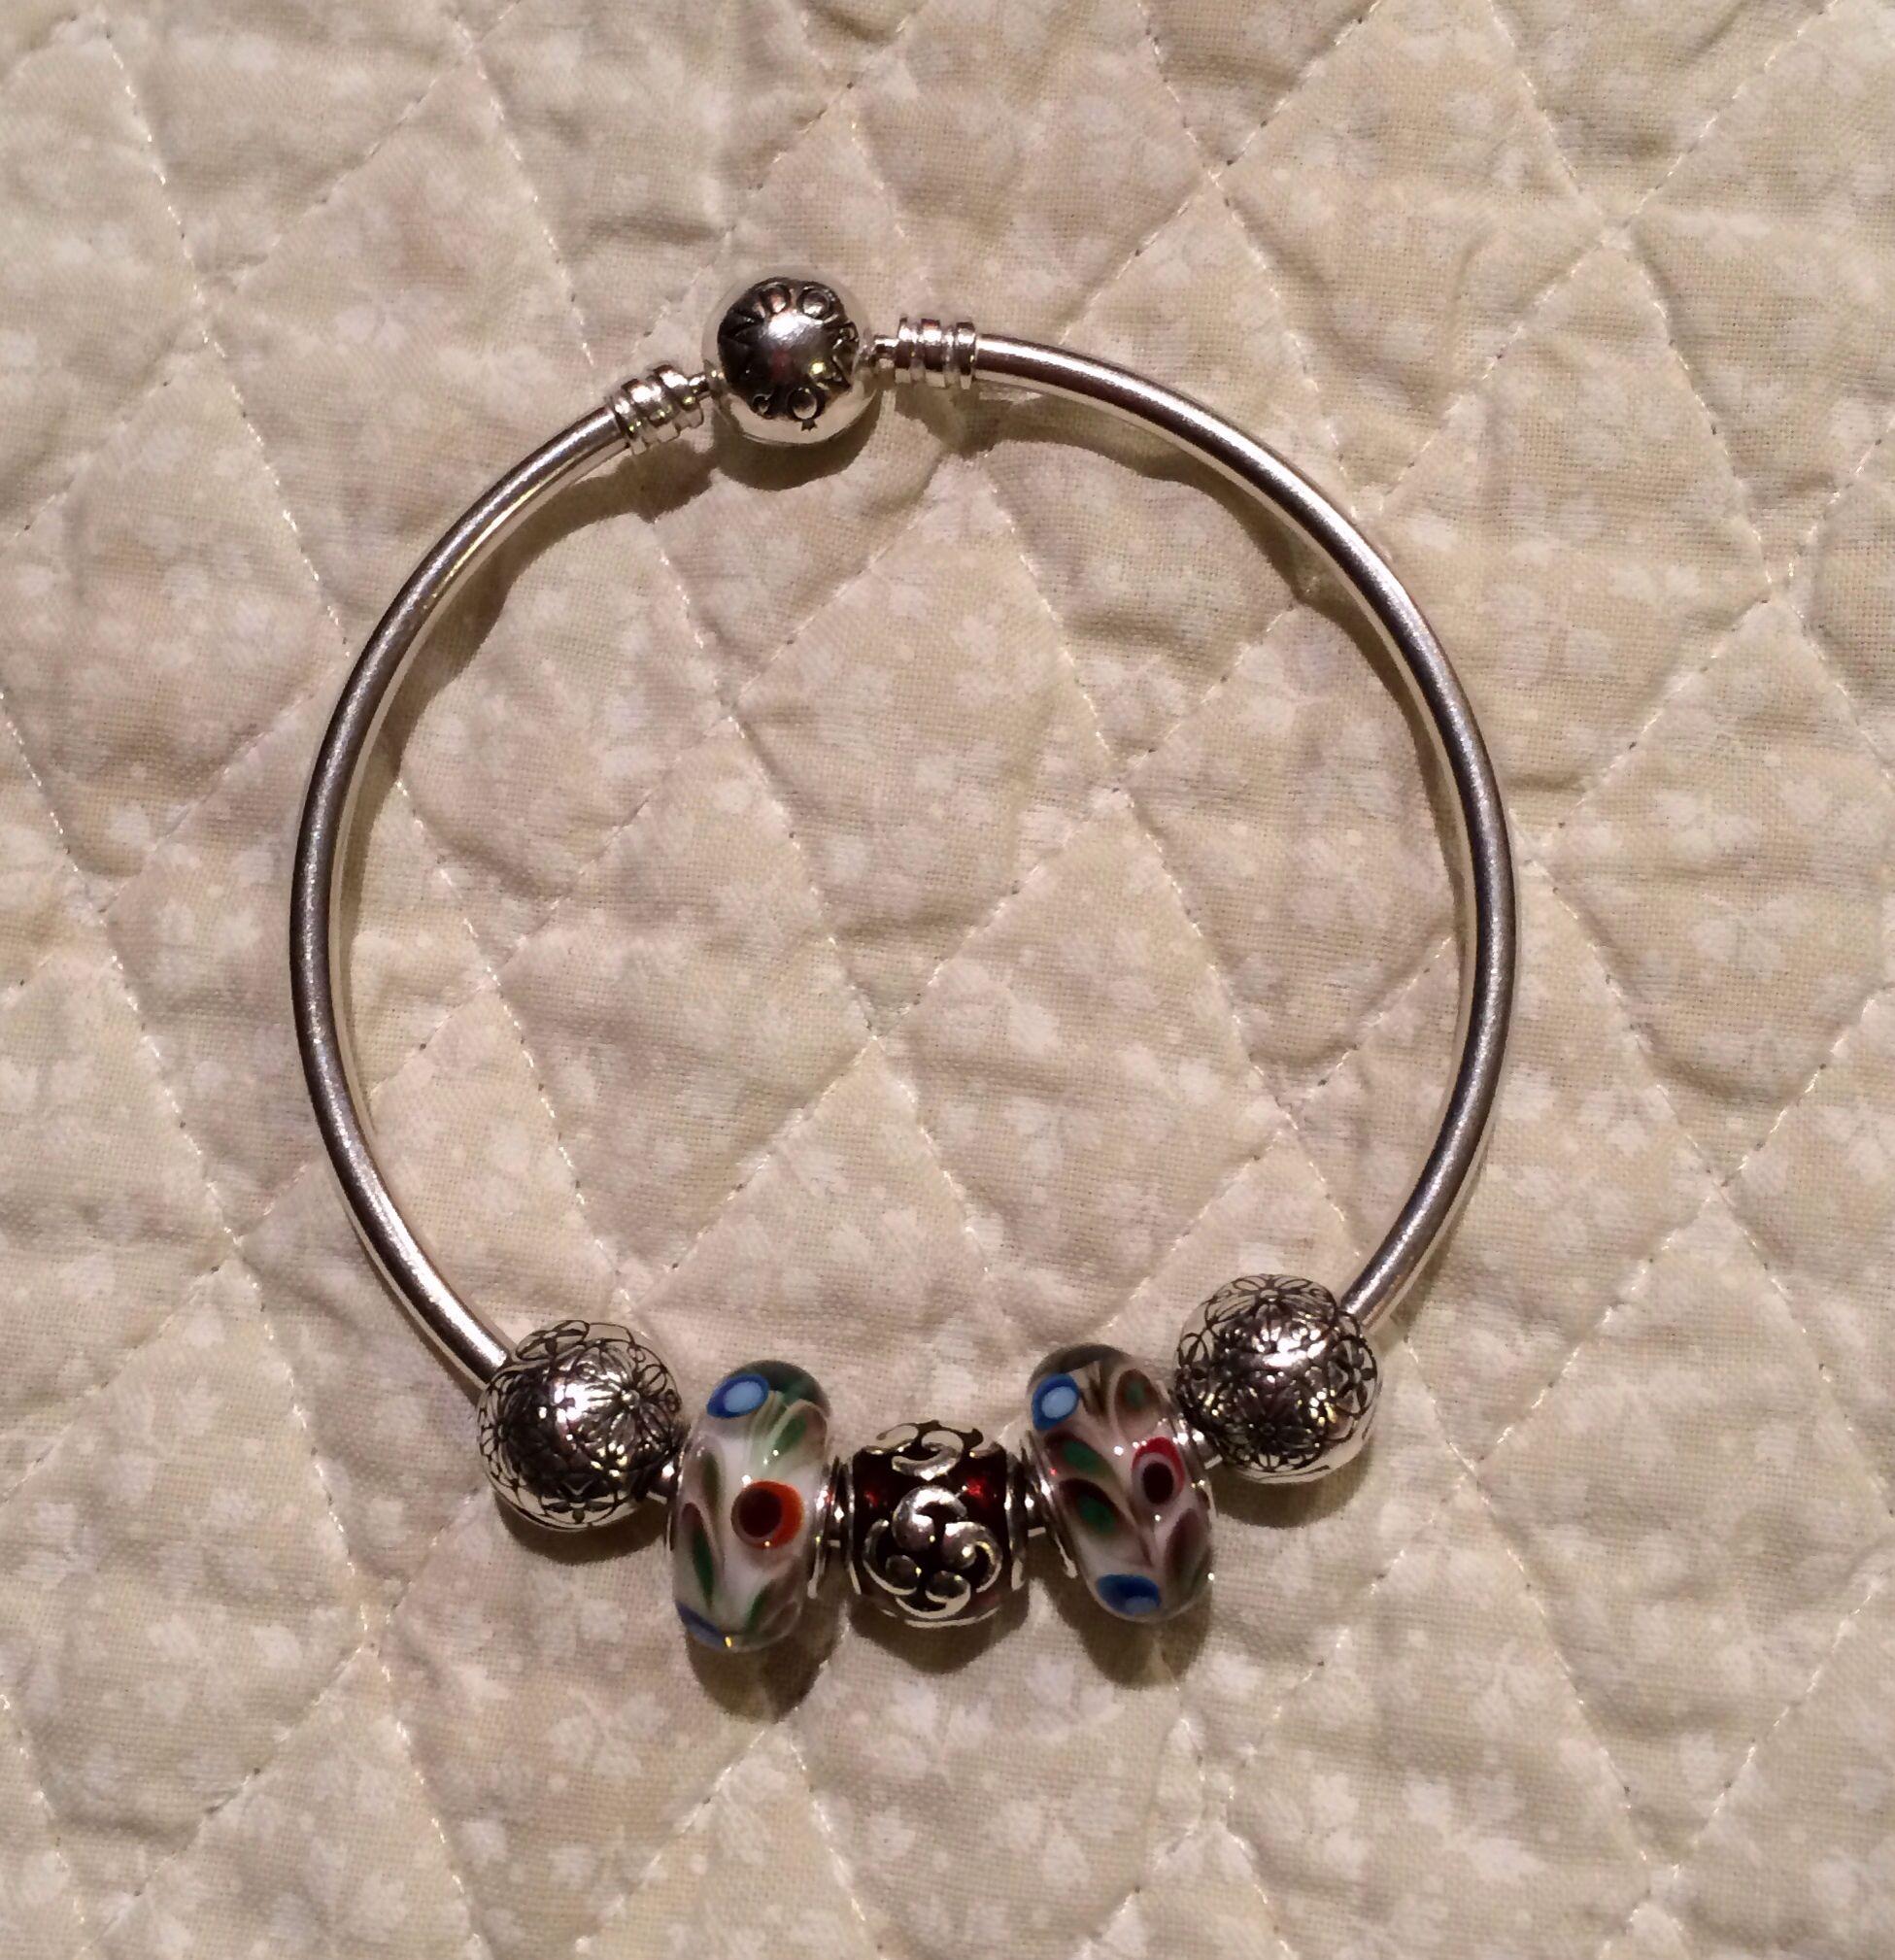 Added the Folklore murano beads to my Pandora bangle. I only like a few beads on the bangle bracelet.